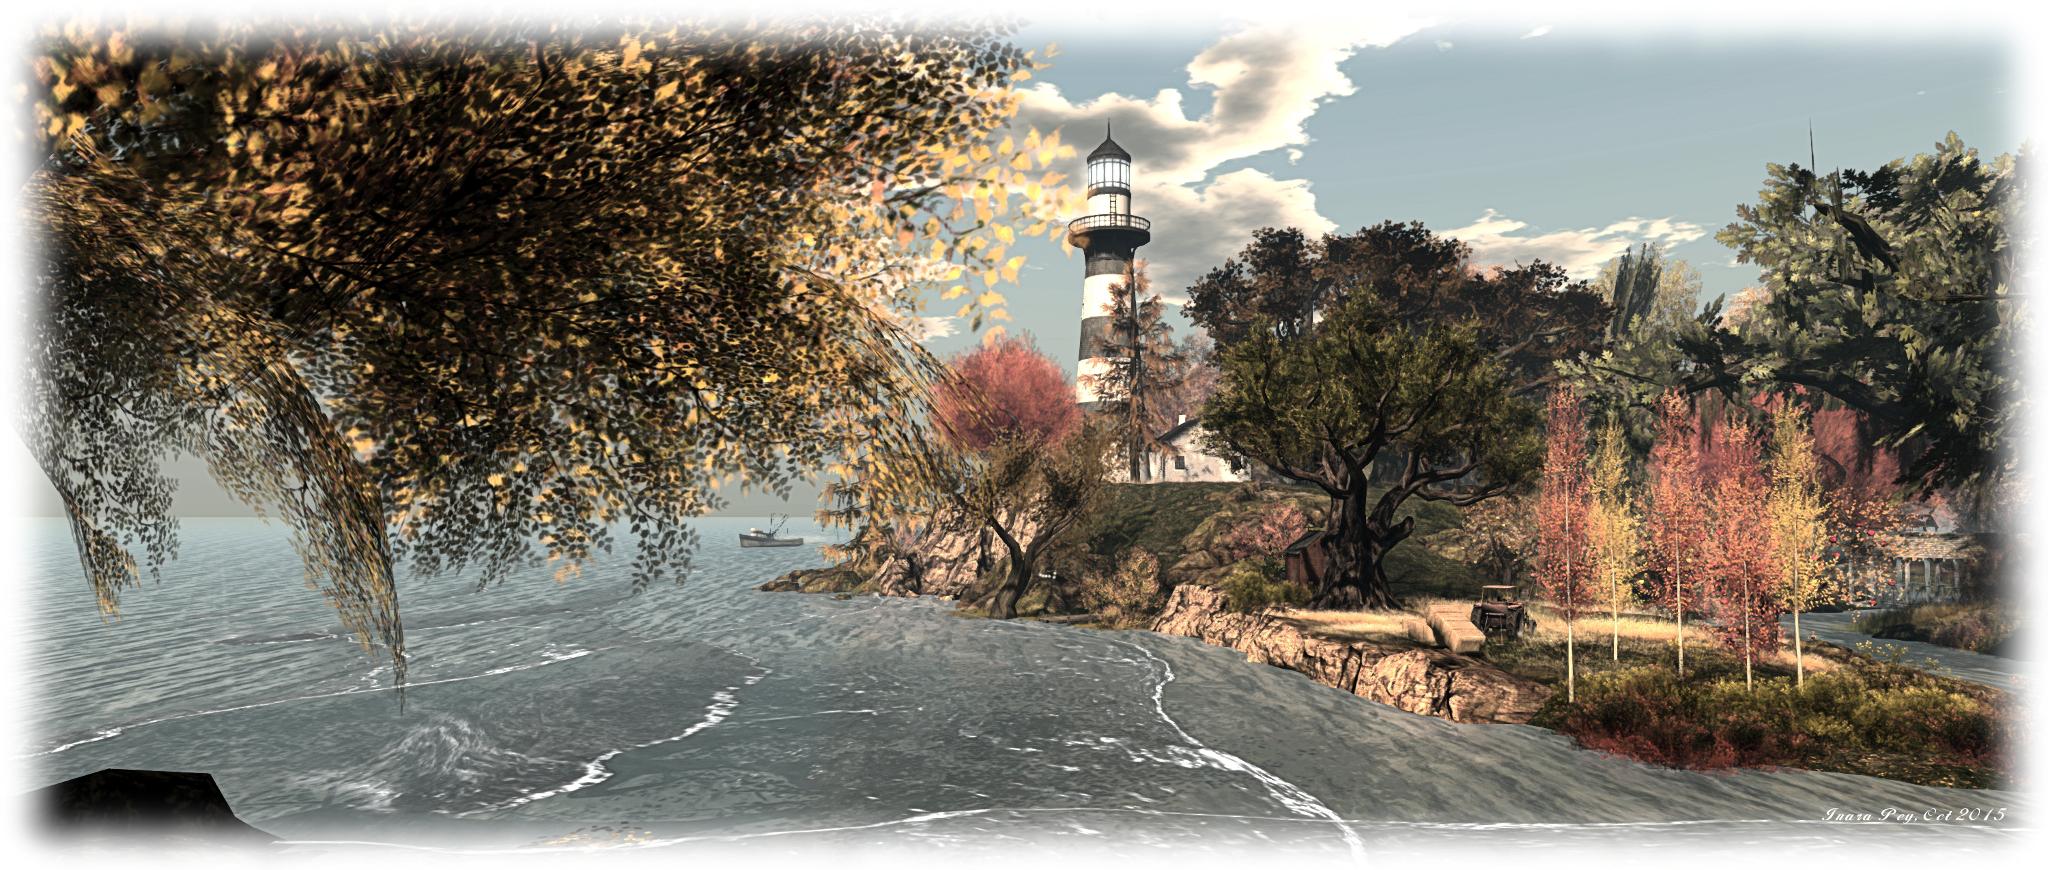 Warm Springs; Inara Pey, October 2015, on Flickr